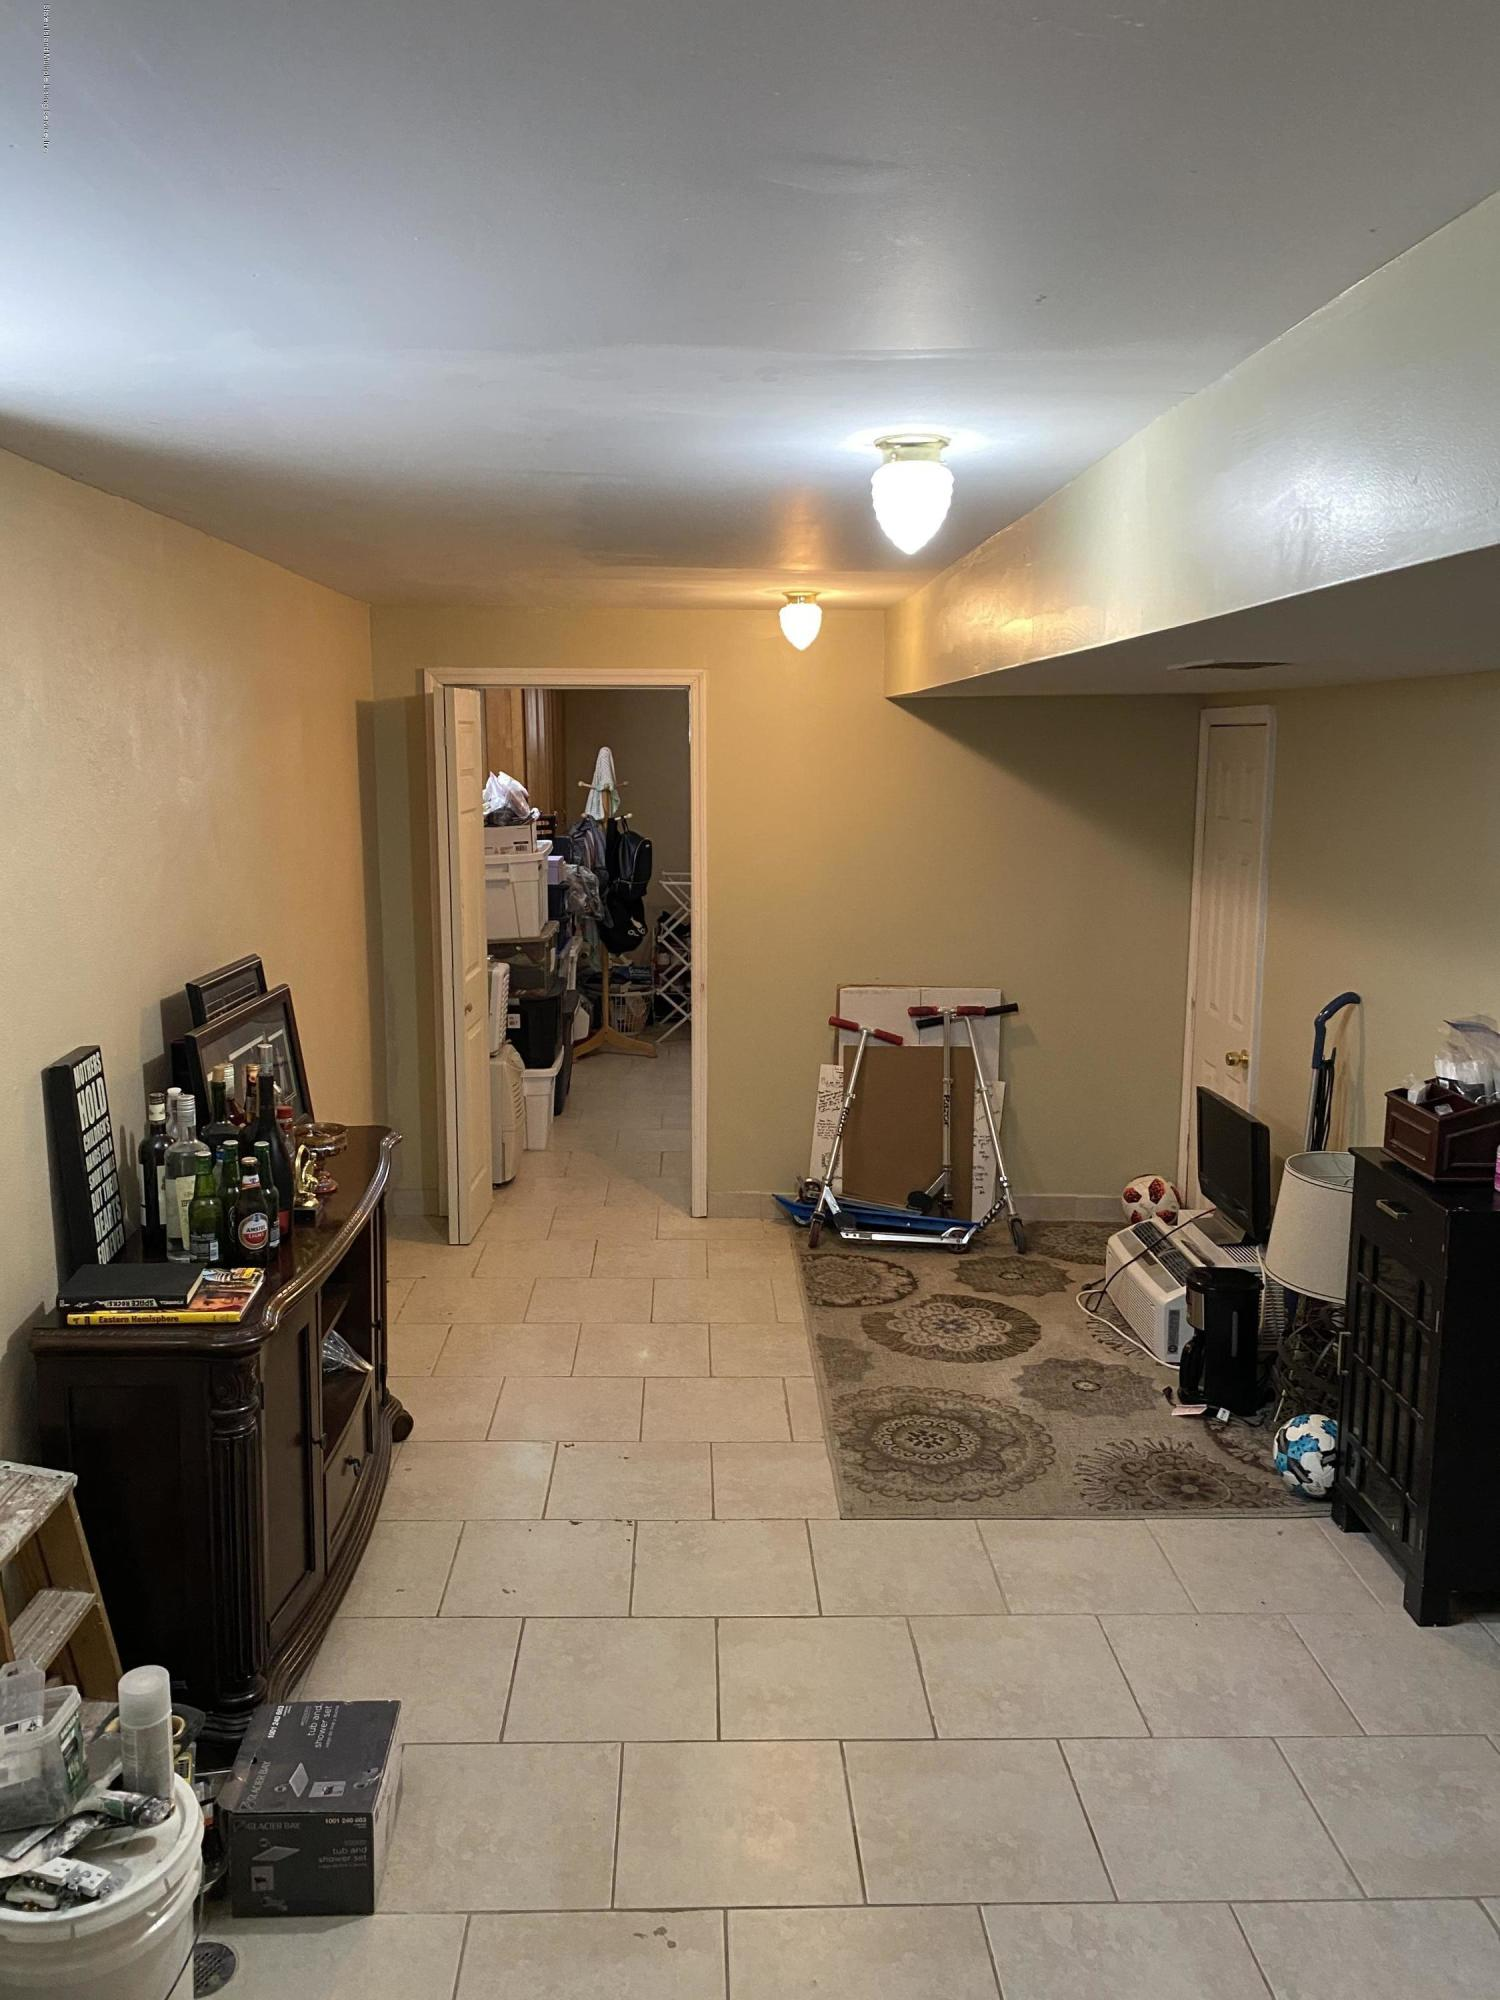 Single Family - Semi-Attached 370 Seaver Avenue  Staten Island, NY 10305, MLS-1136339-27